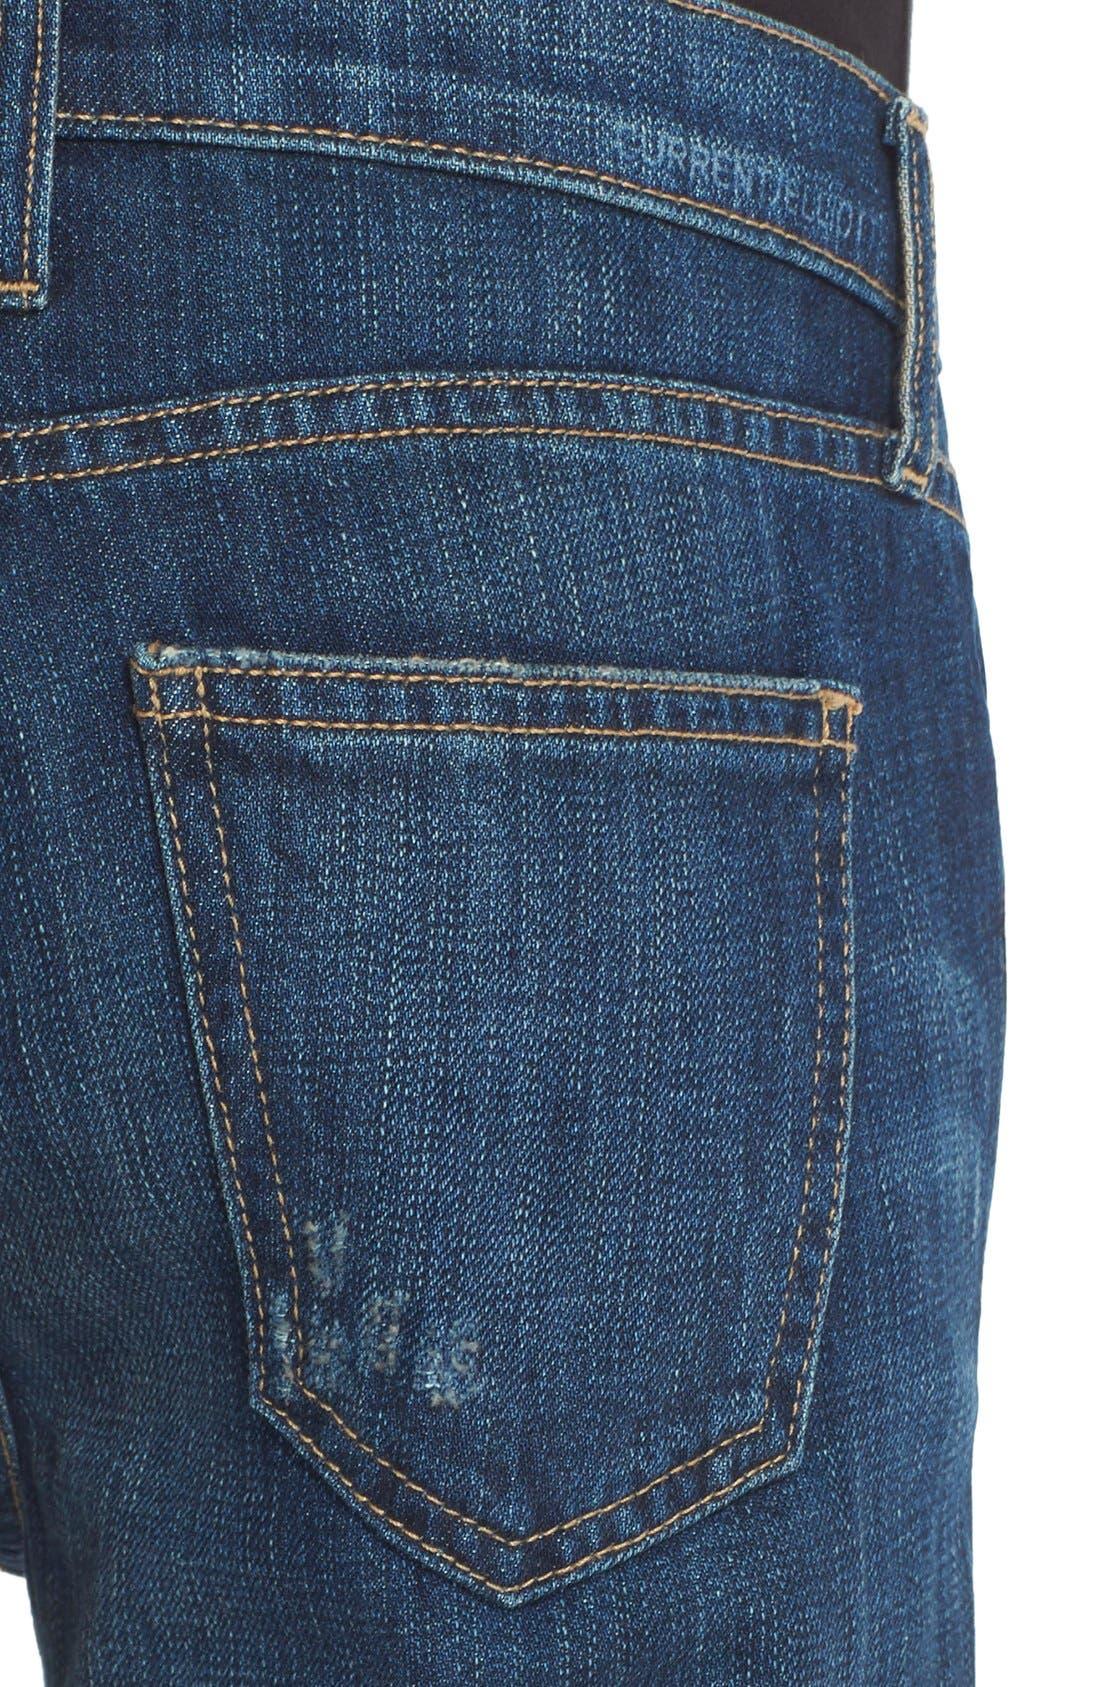 Alternate Image 4  - Current/Elliott 'The Fling' Boyfriend Jeans (Loved Destroy)